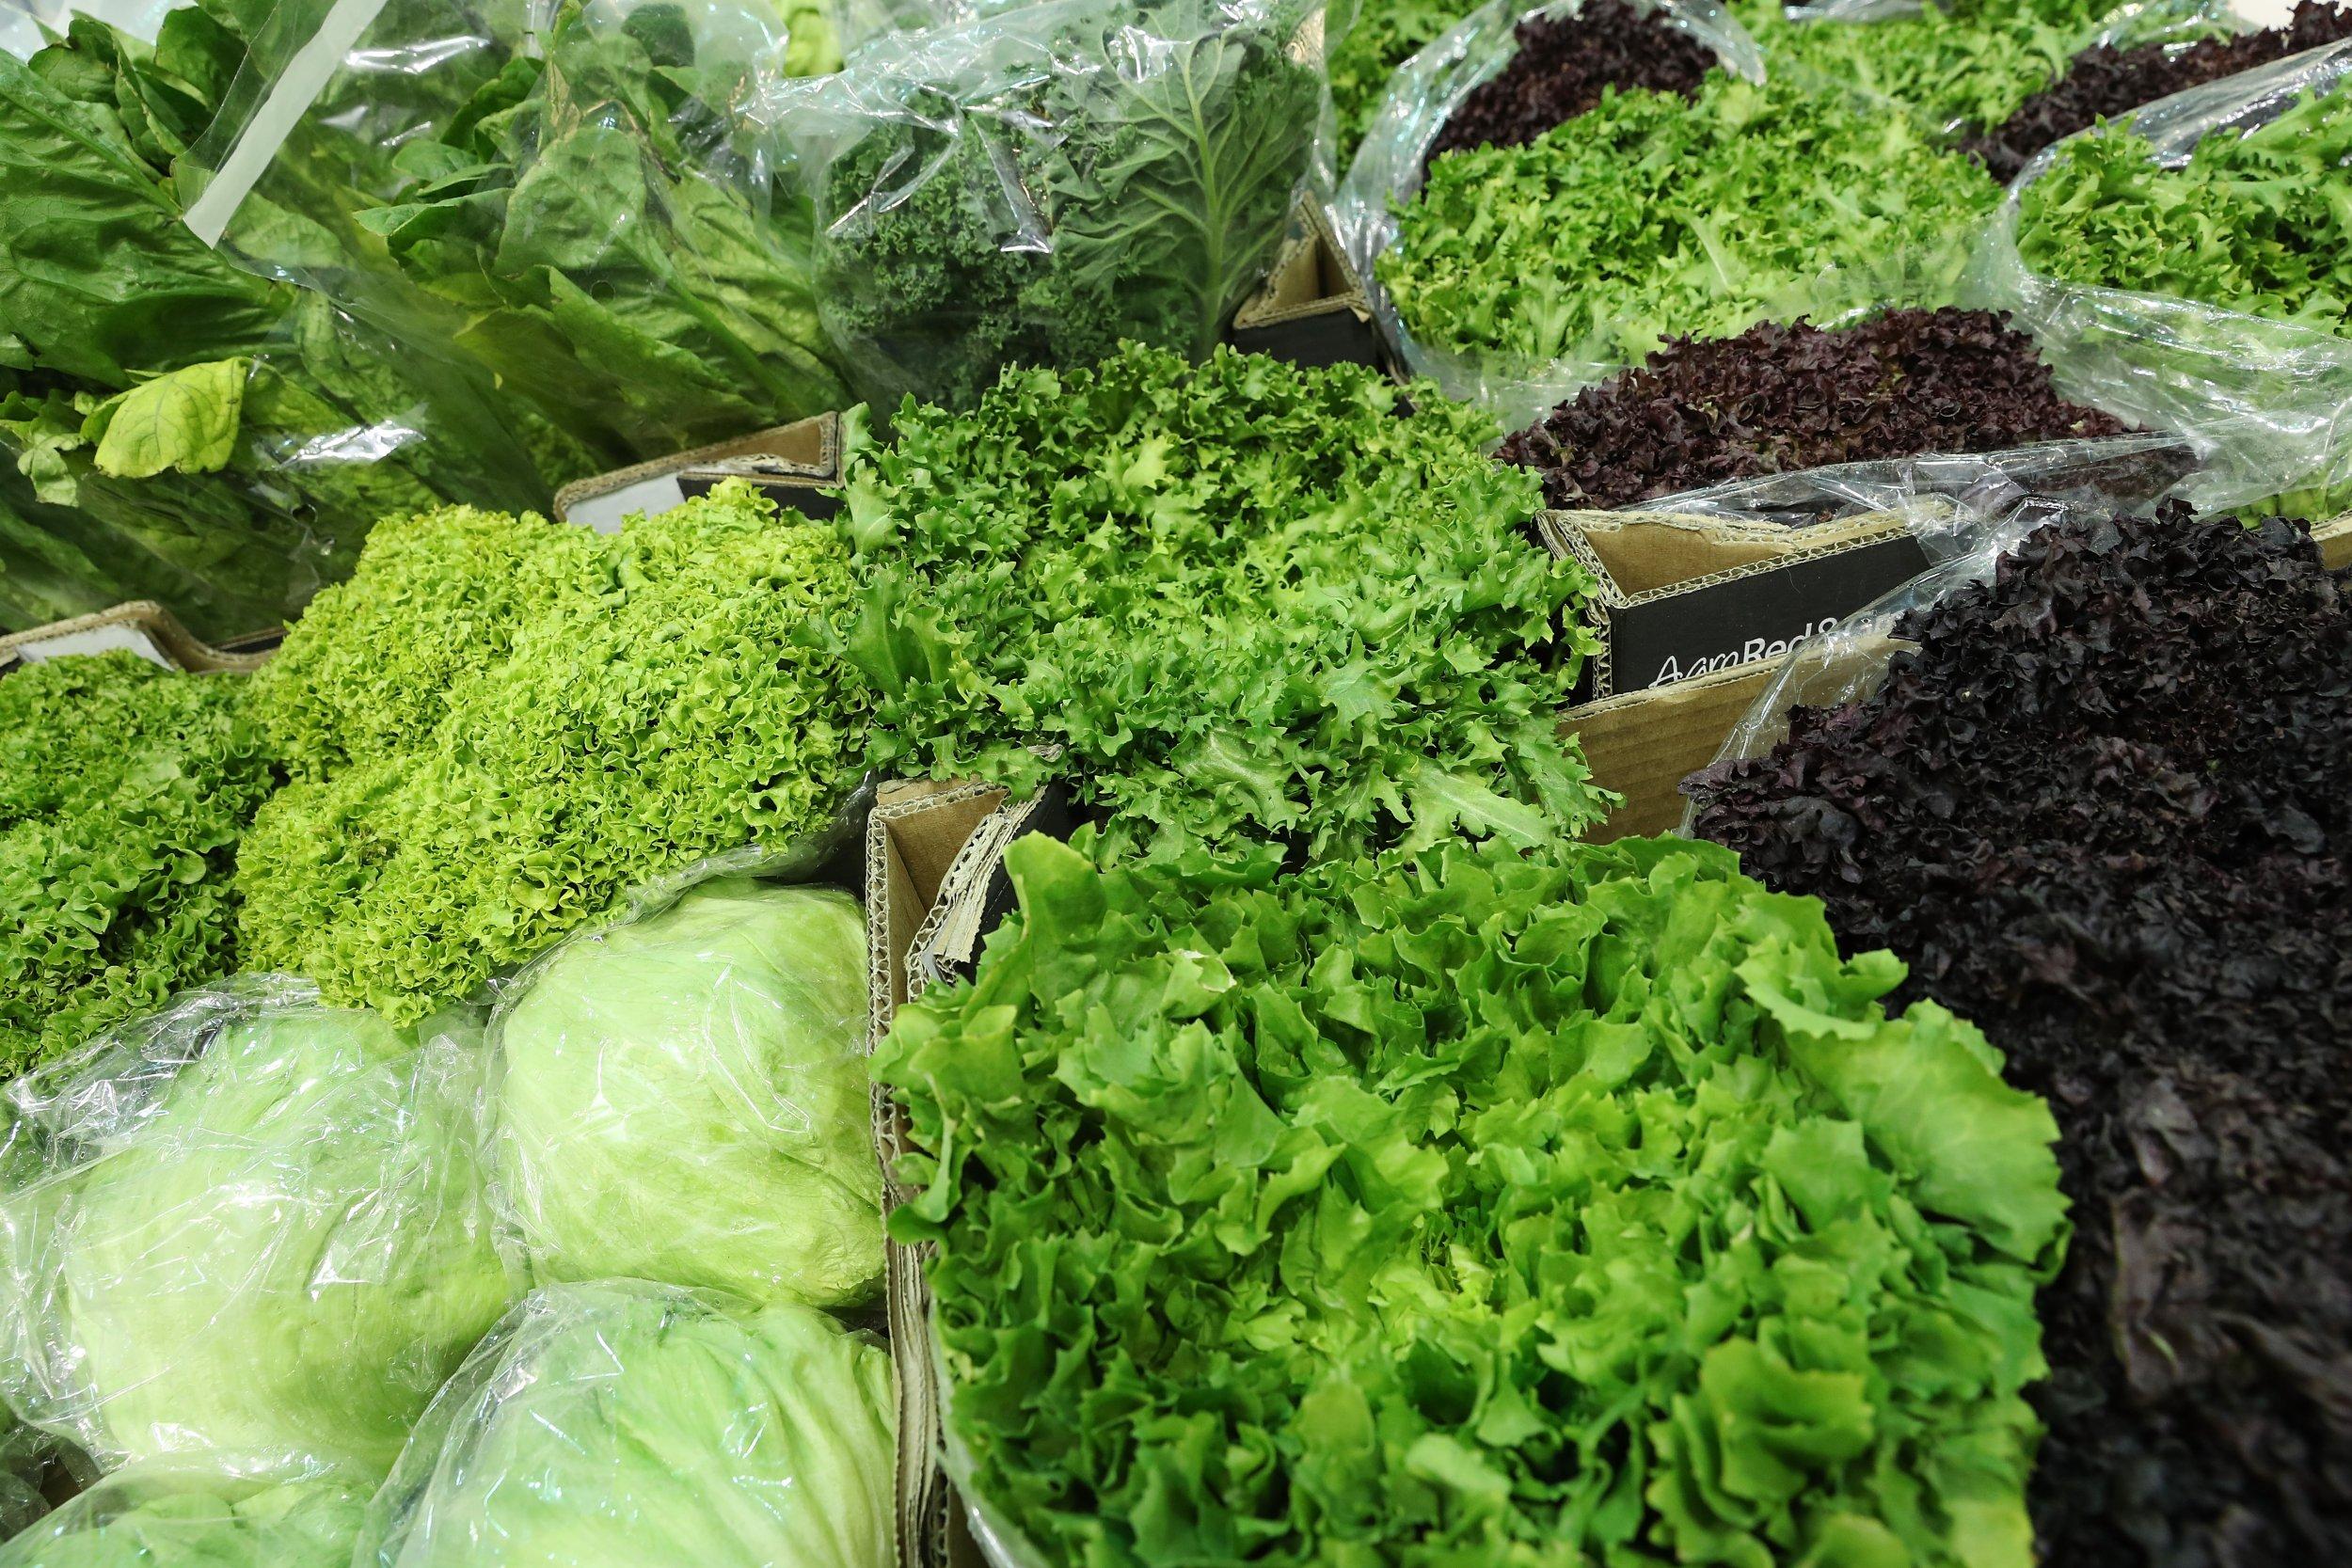 Deadly E Coli Hiding In Romaine Lettuce Means Eating